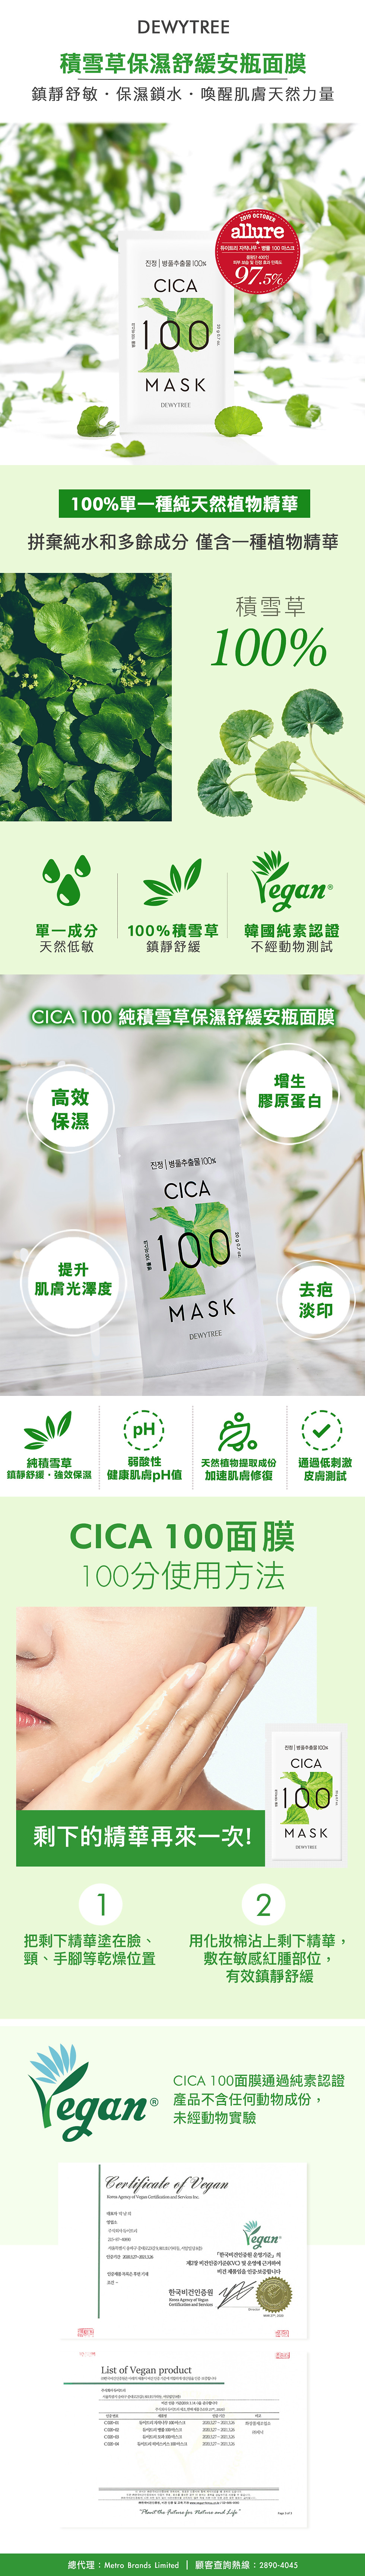 WEB_CICA100_mask_v2.jpg